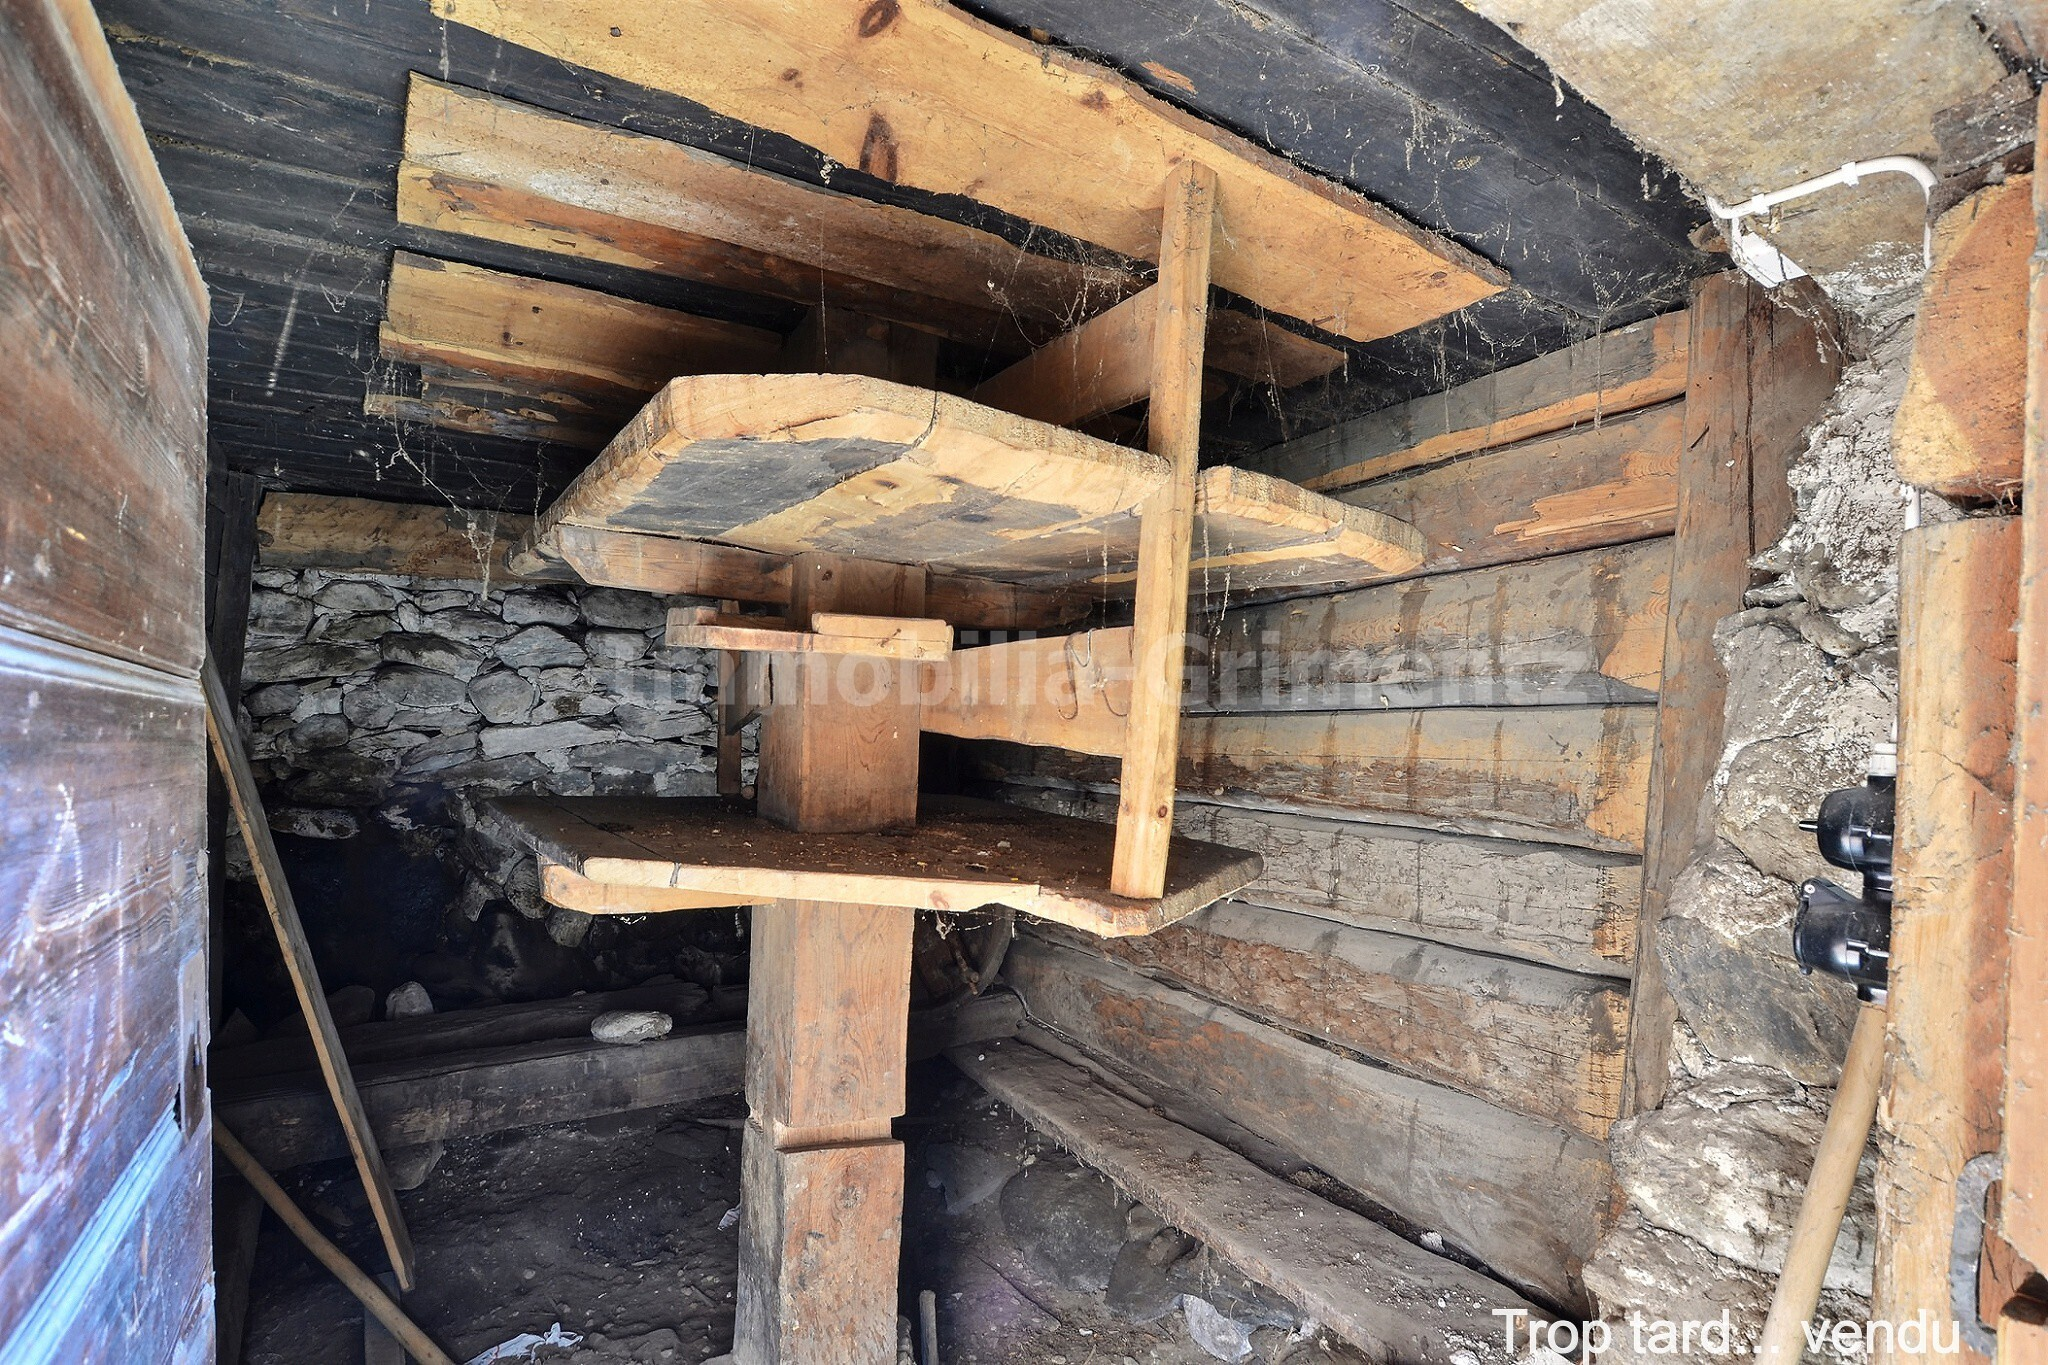 Keller und tsambron